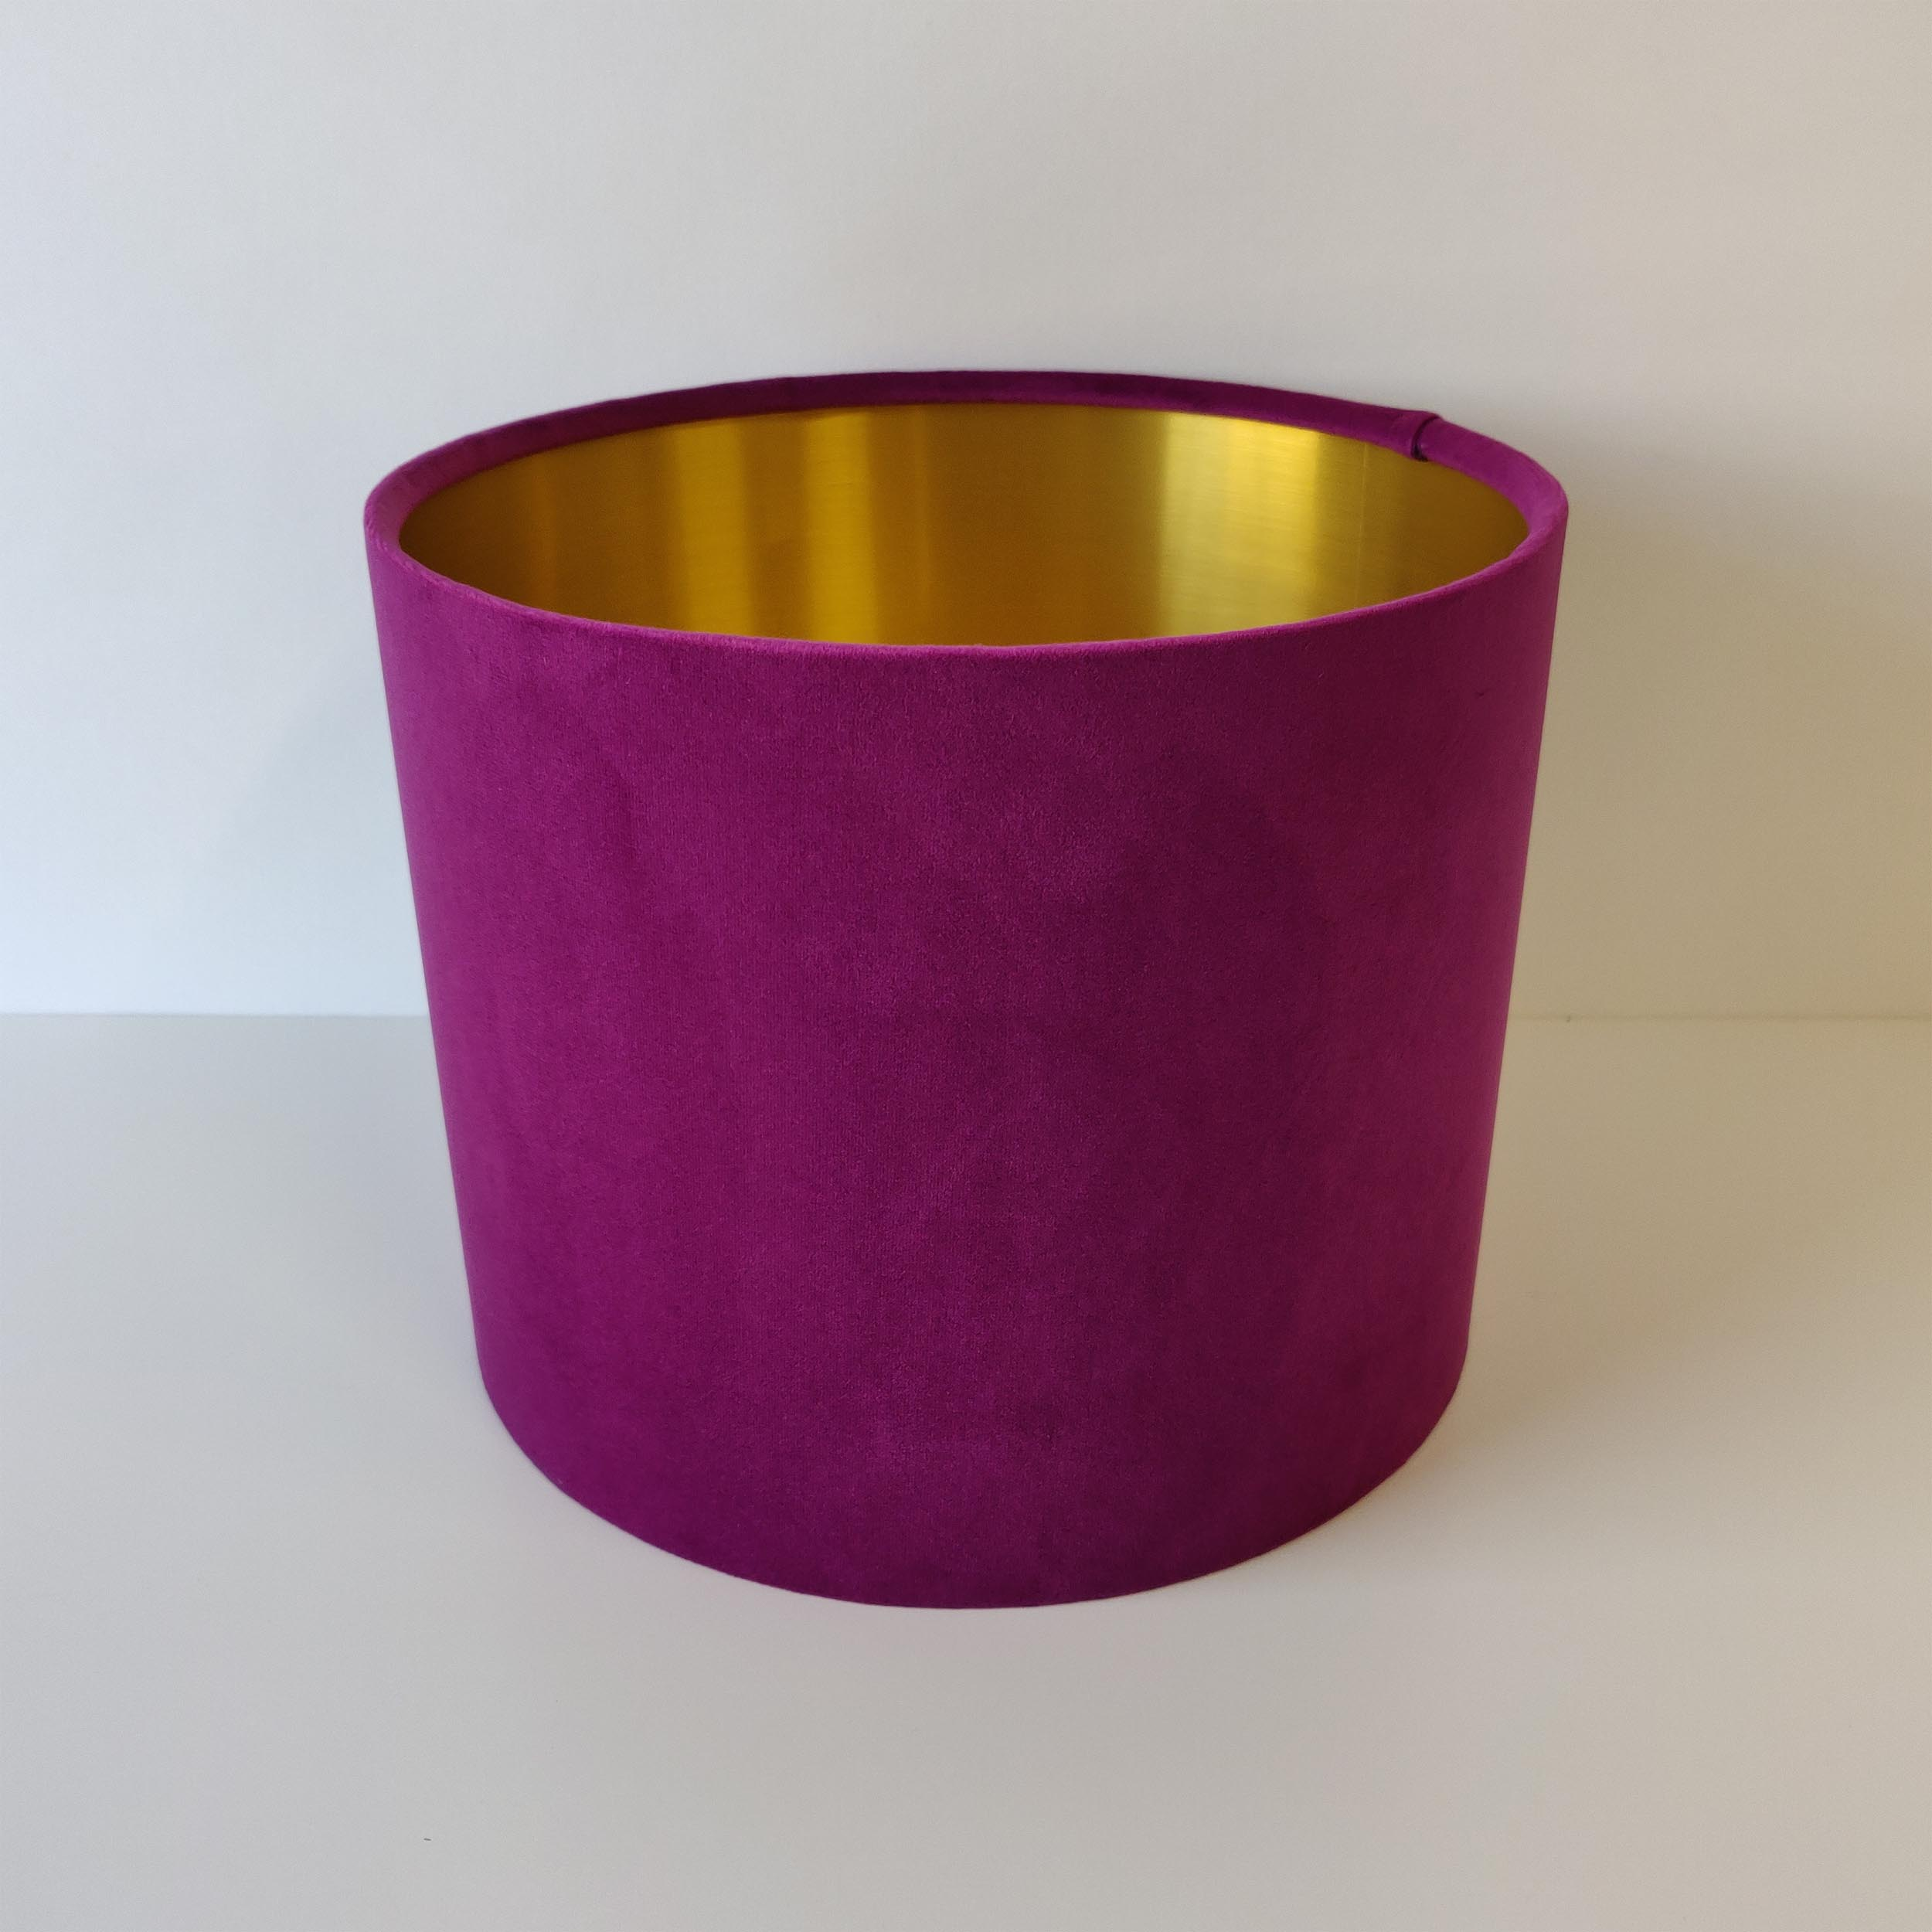 Plum Purple Velvet Lampshade with Gold Lining